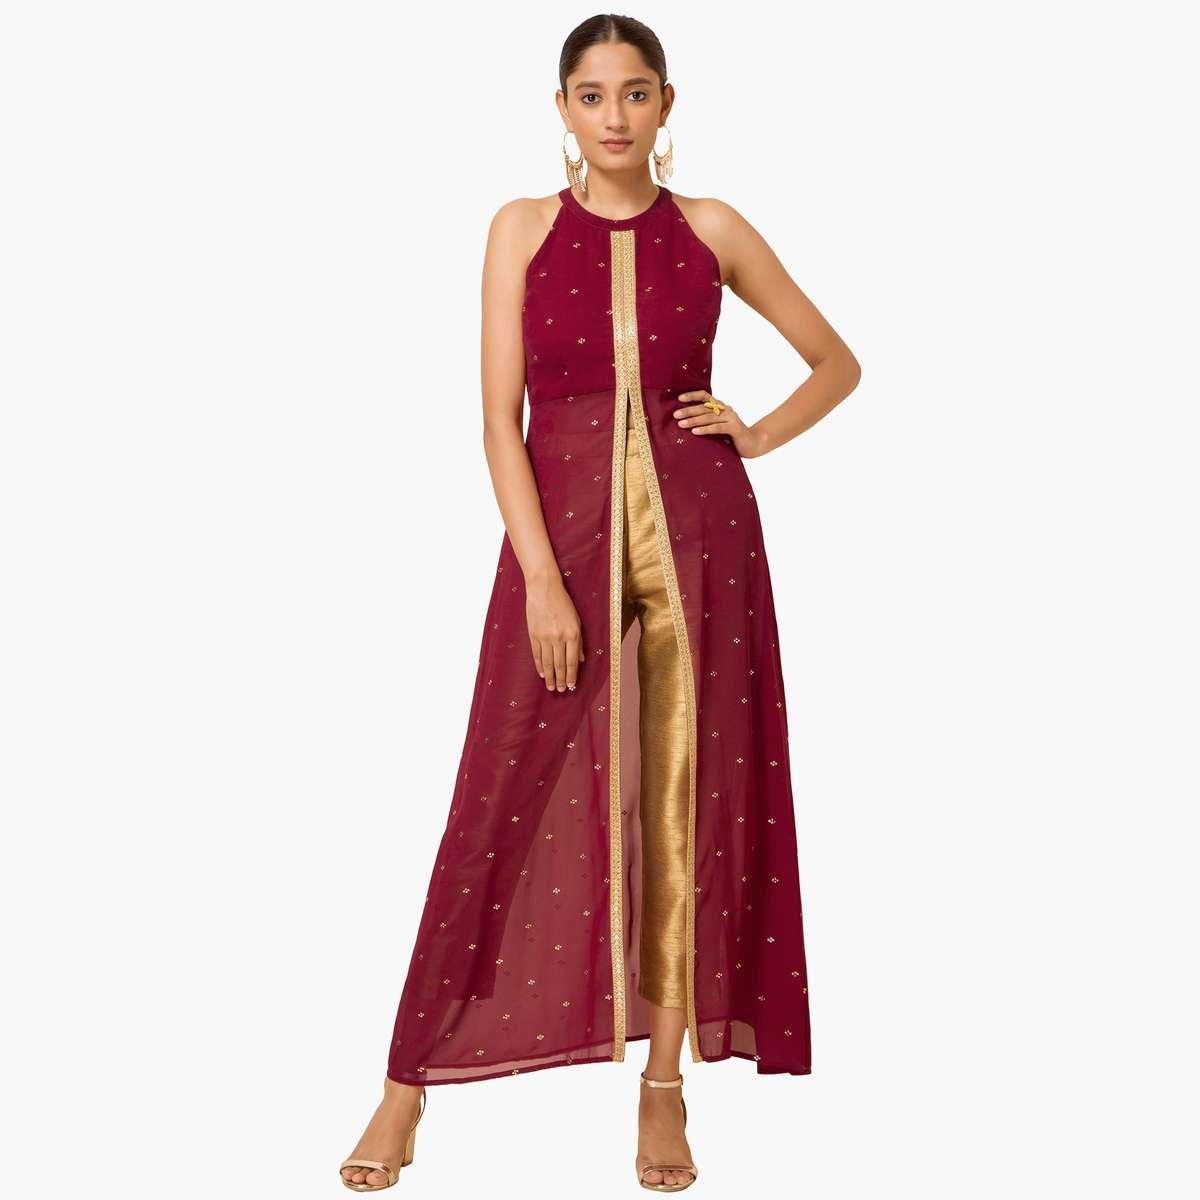 3.INDYA Women Embellished High Slit Tunic